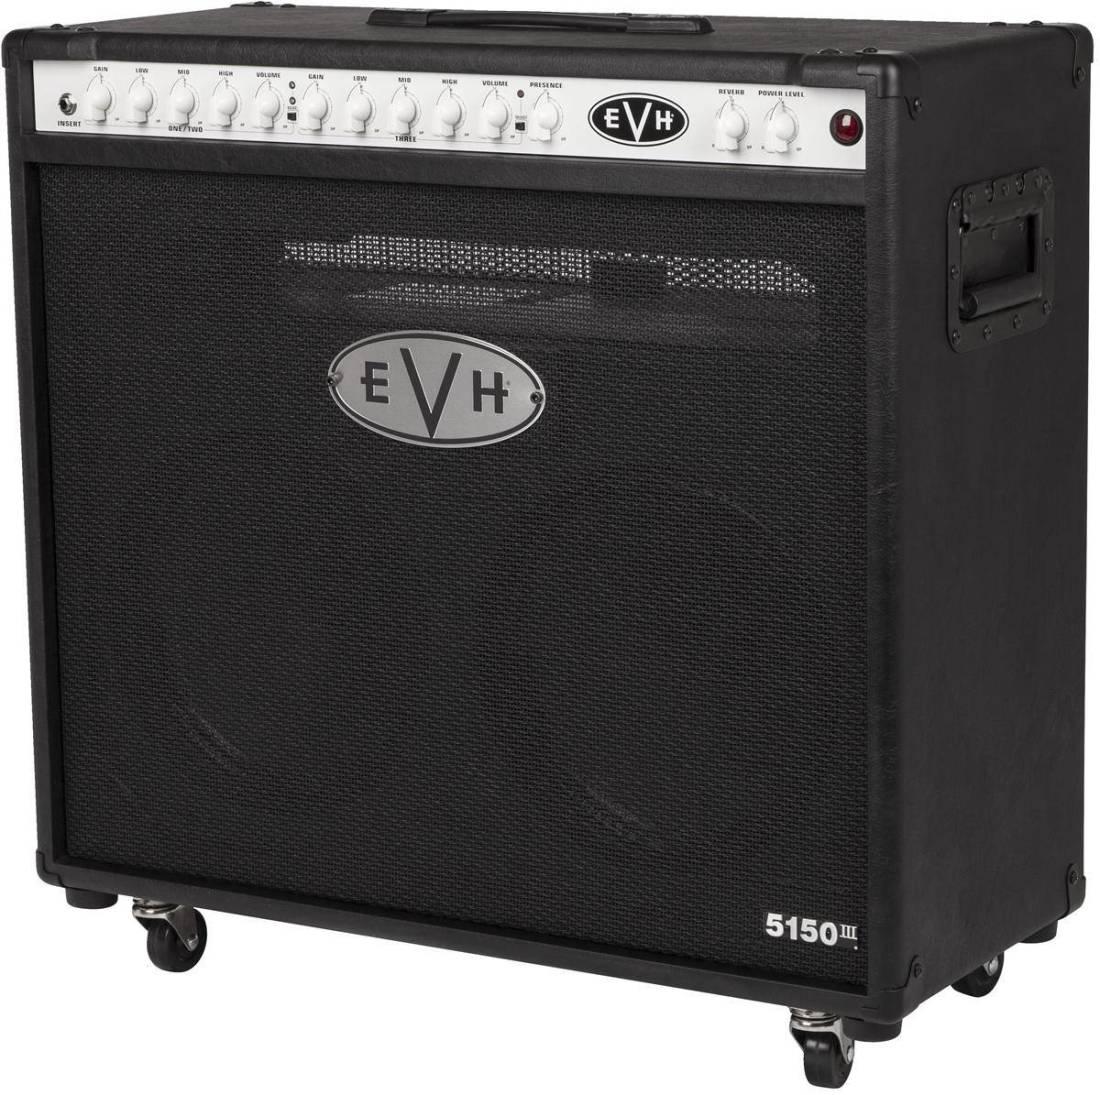 evh 5150iii 2x12 50w combo amp black long mcquade musical instruments. Black Bedroom Furniture Sets. Home Design Ideas